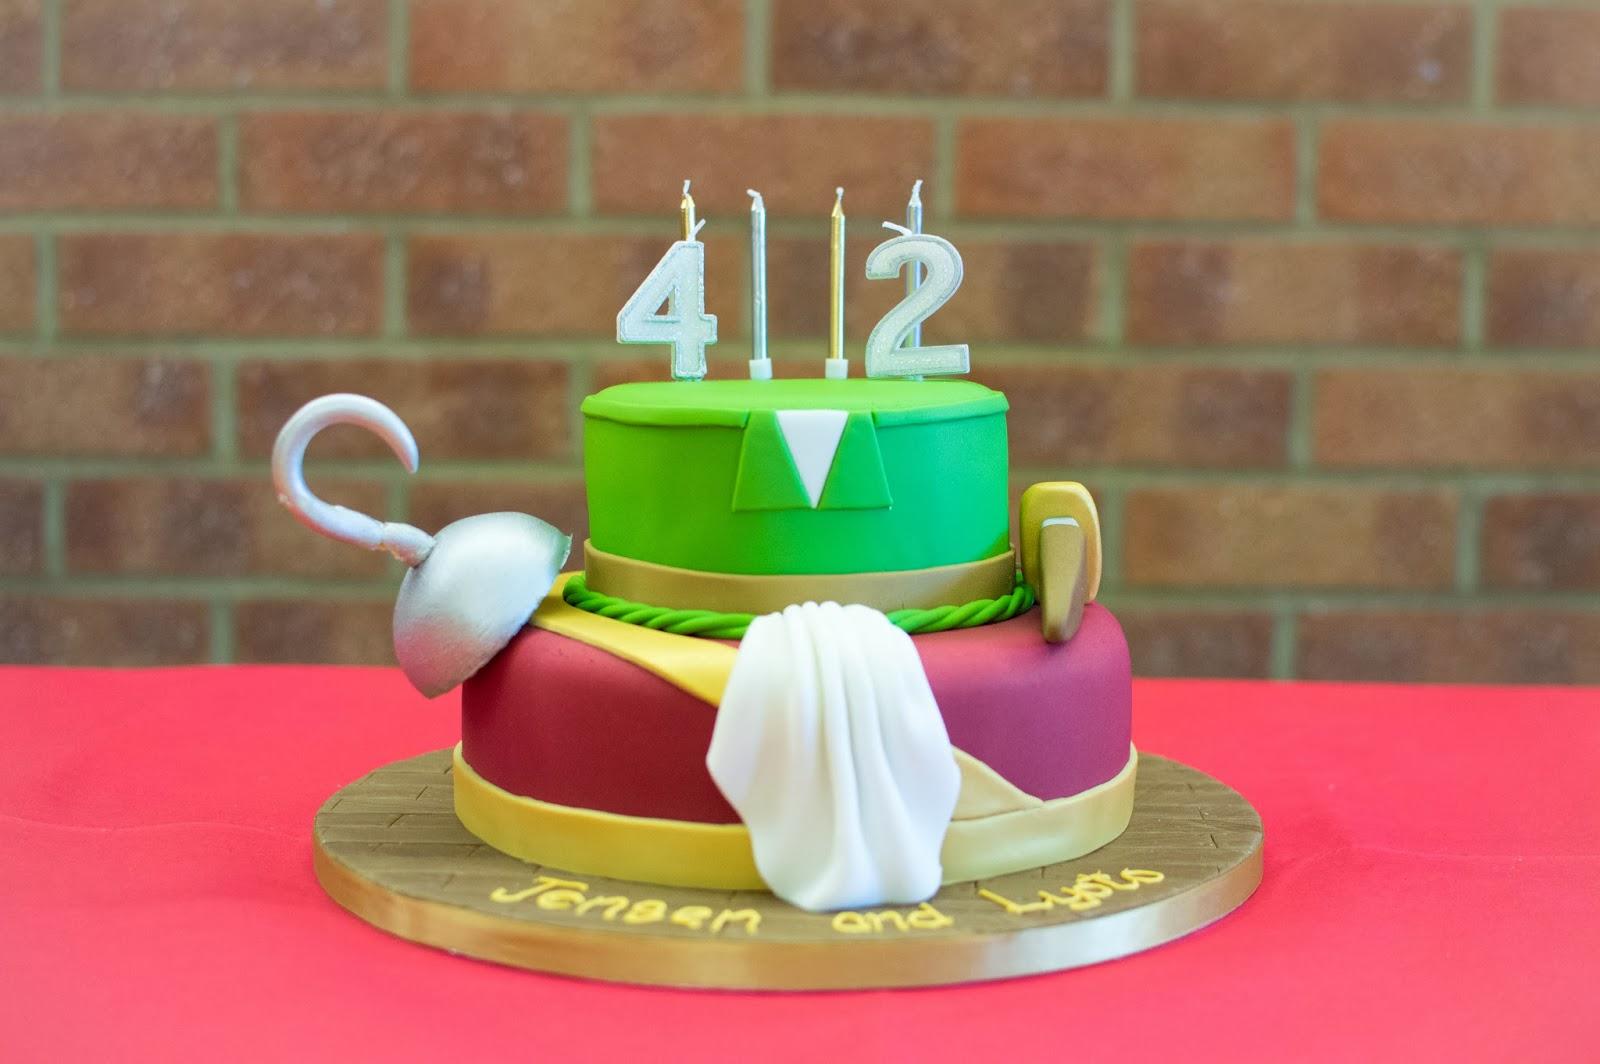 FAITH, TRUST & EDIBLE PIXIE DUST: OUR NEVERLAND BIRTHDAY PARTY DETAILS